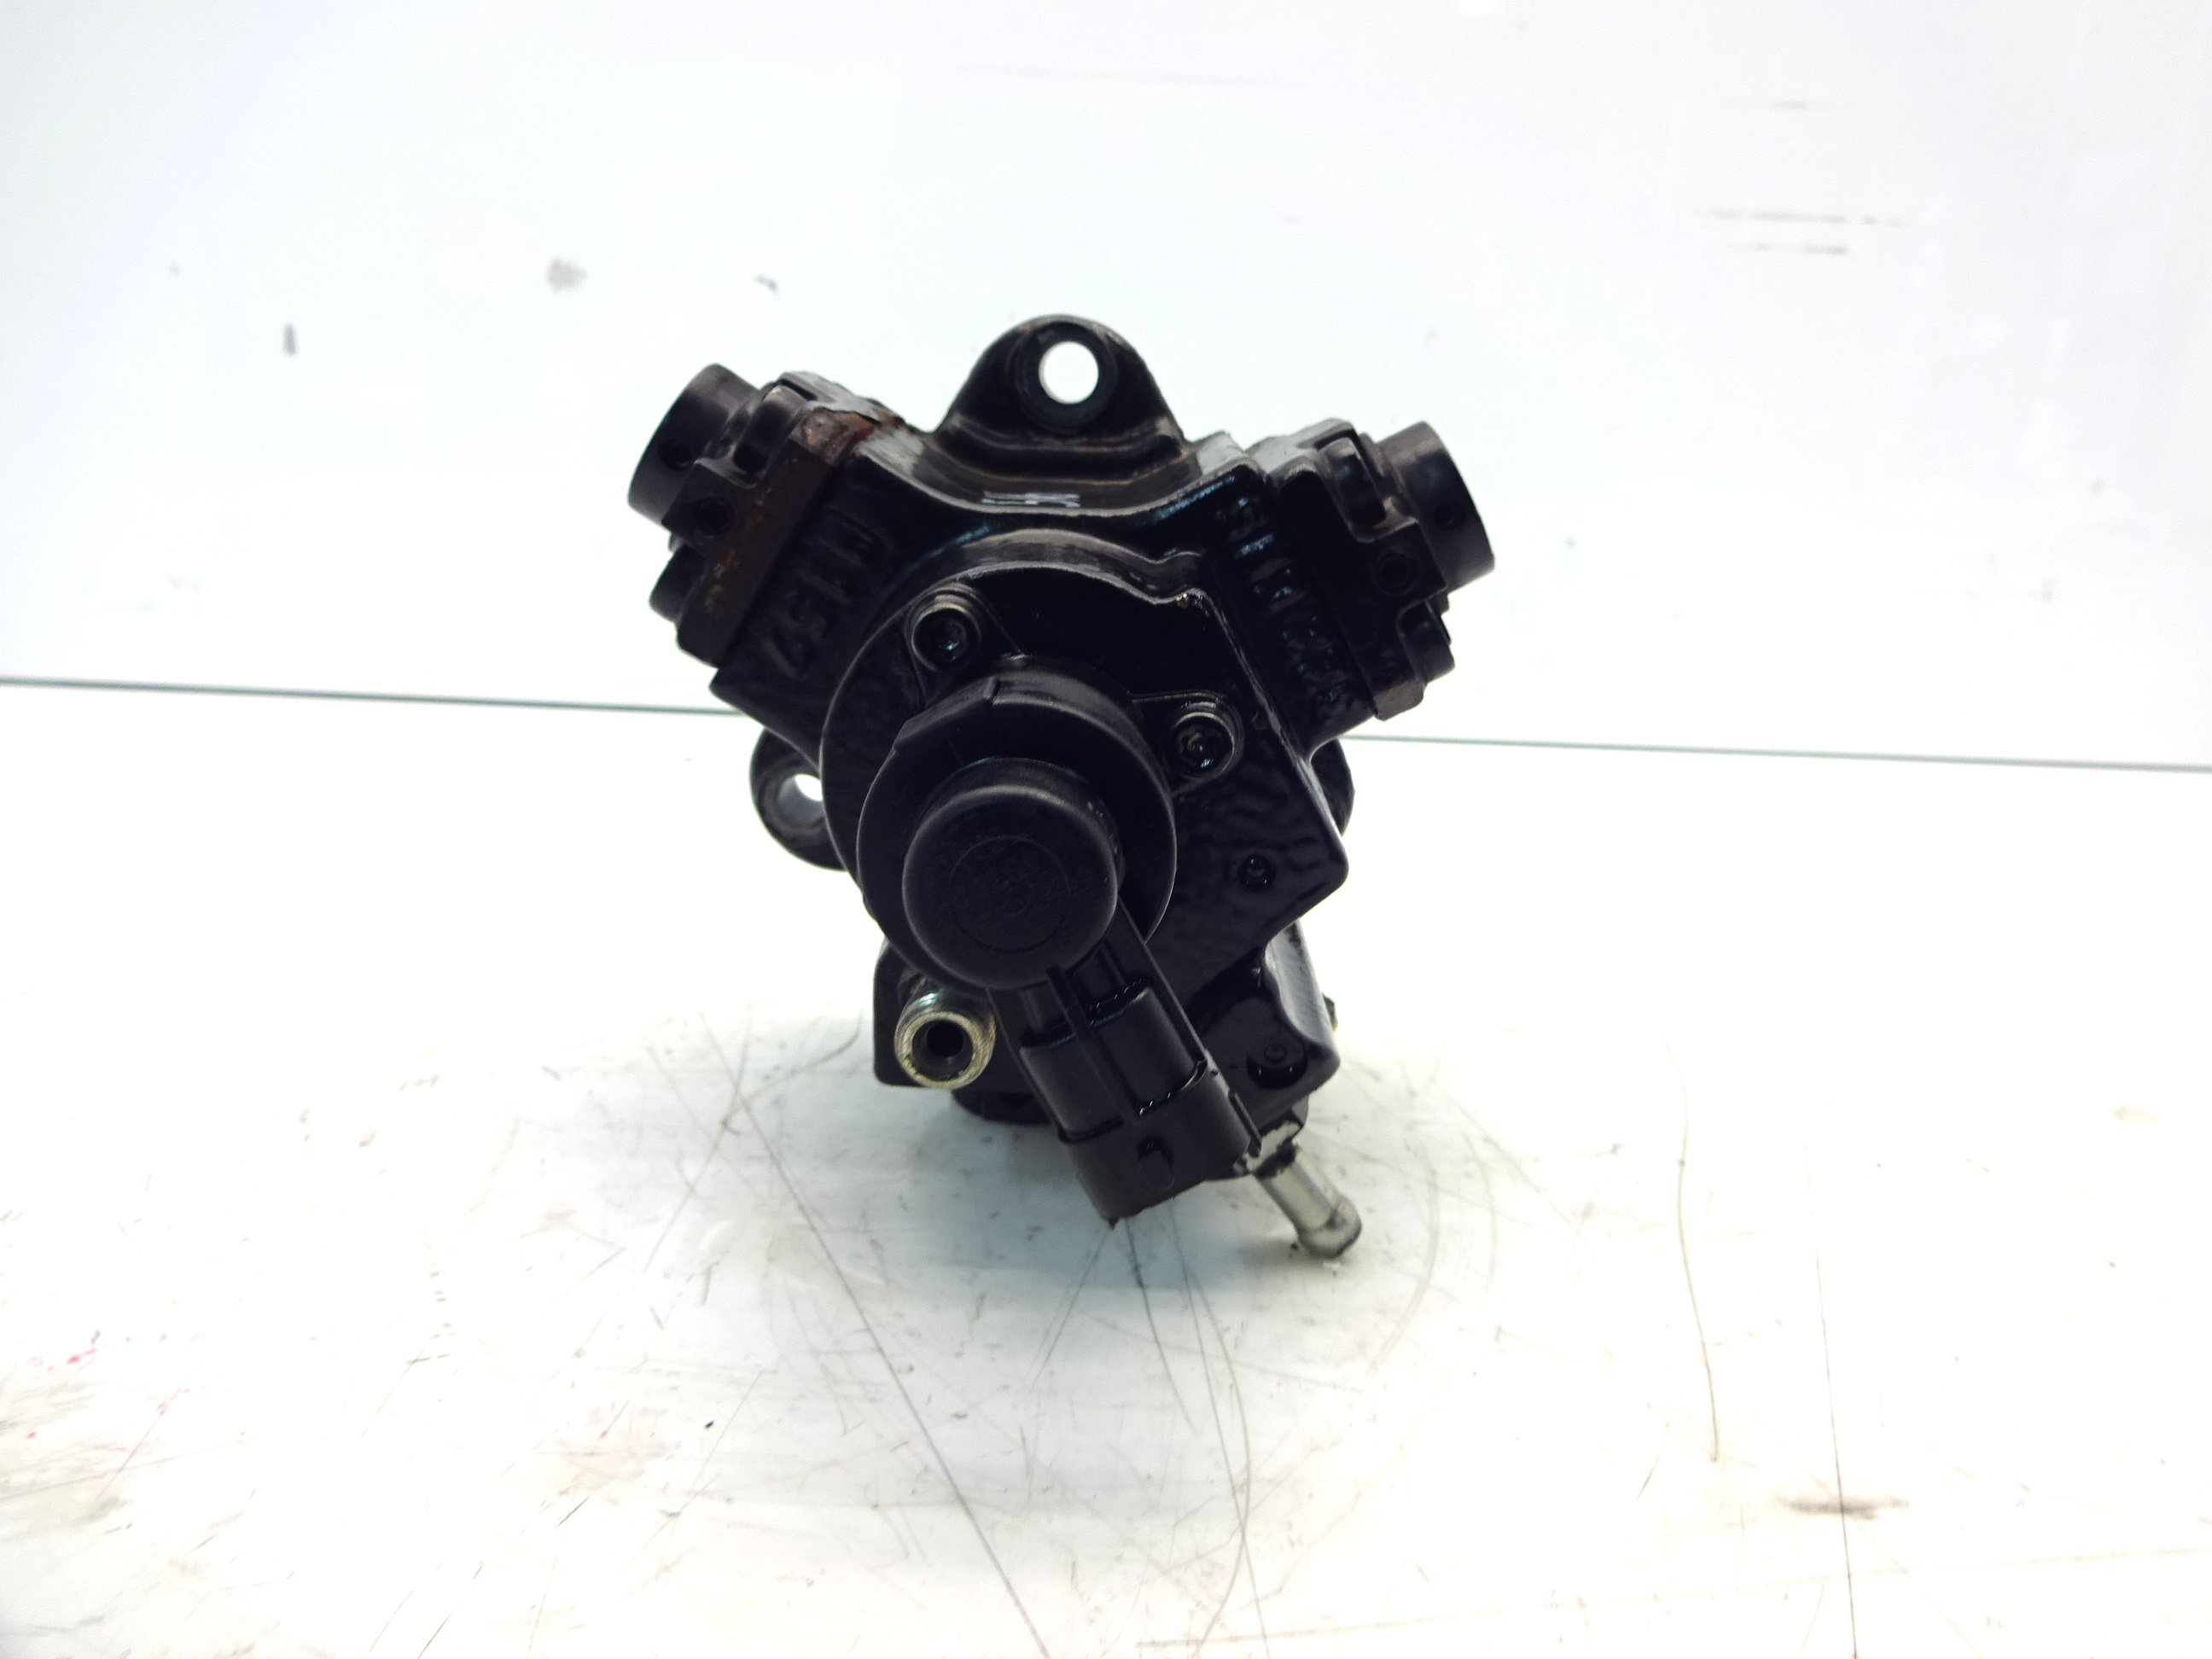 Hochdruckpumpe Cadillac Opel Saab Zafira 9-3 9-5 1,9 CDTI Z19DTH 55209064